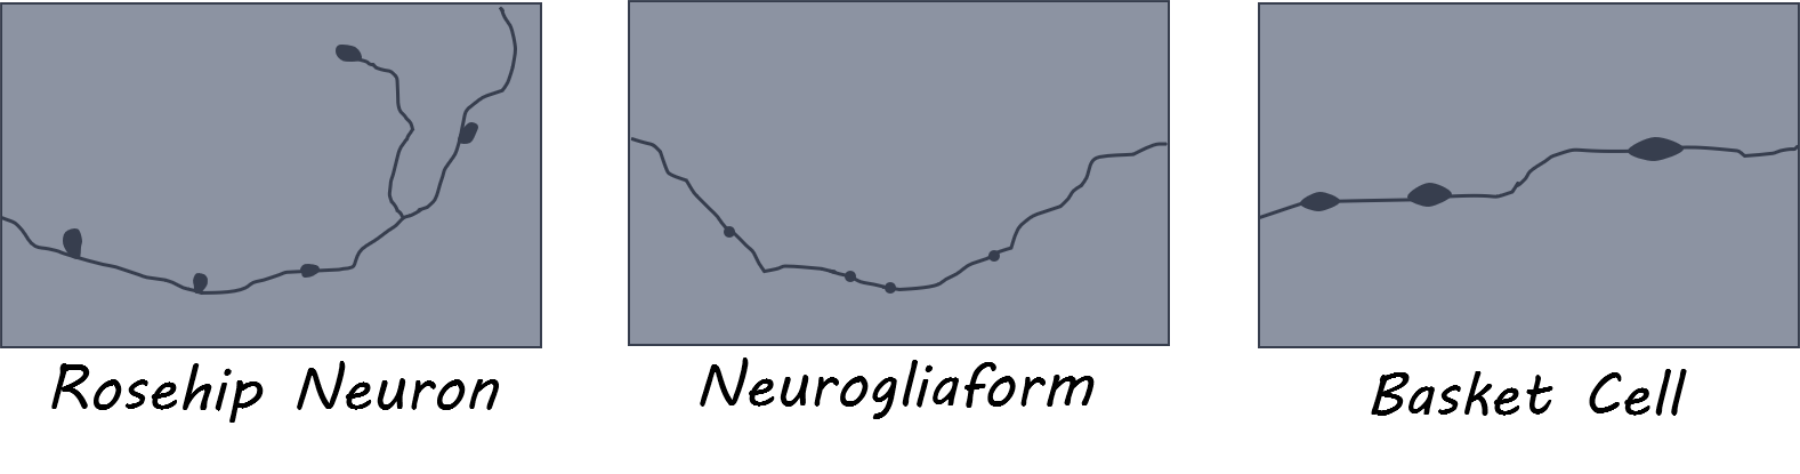 rosehip1800 (1).png